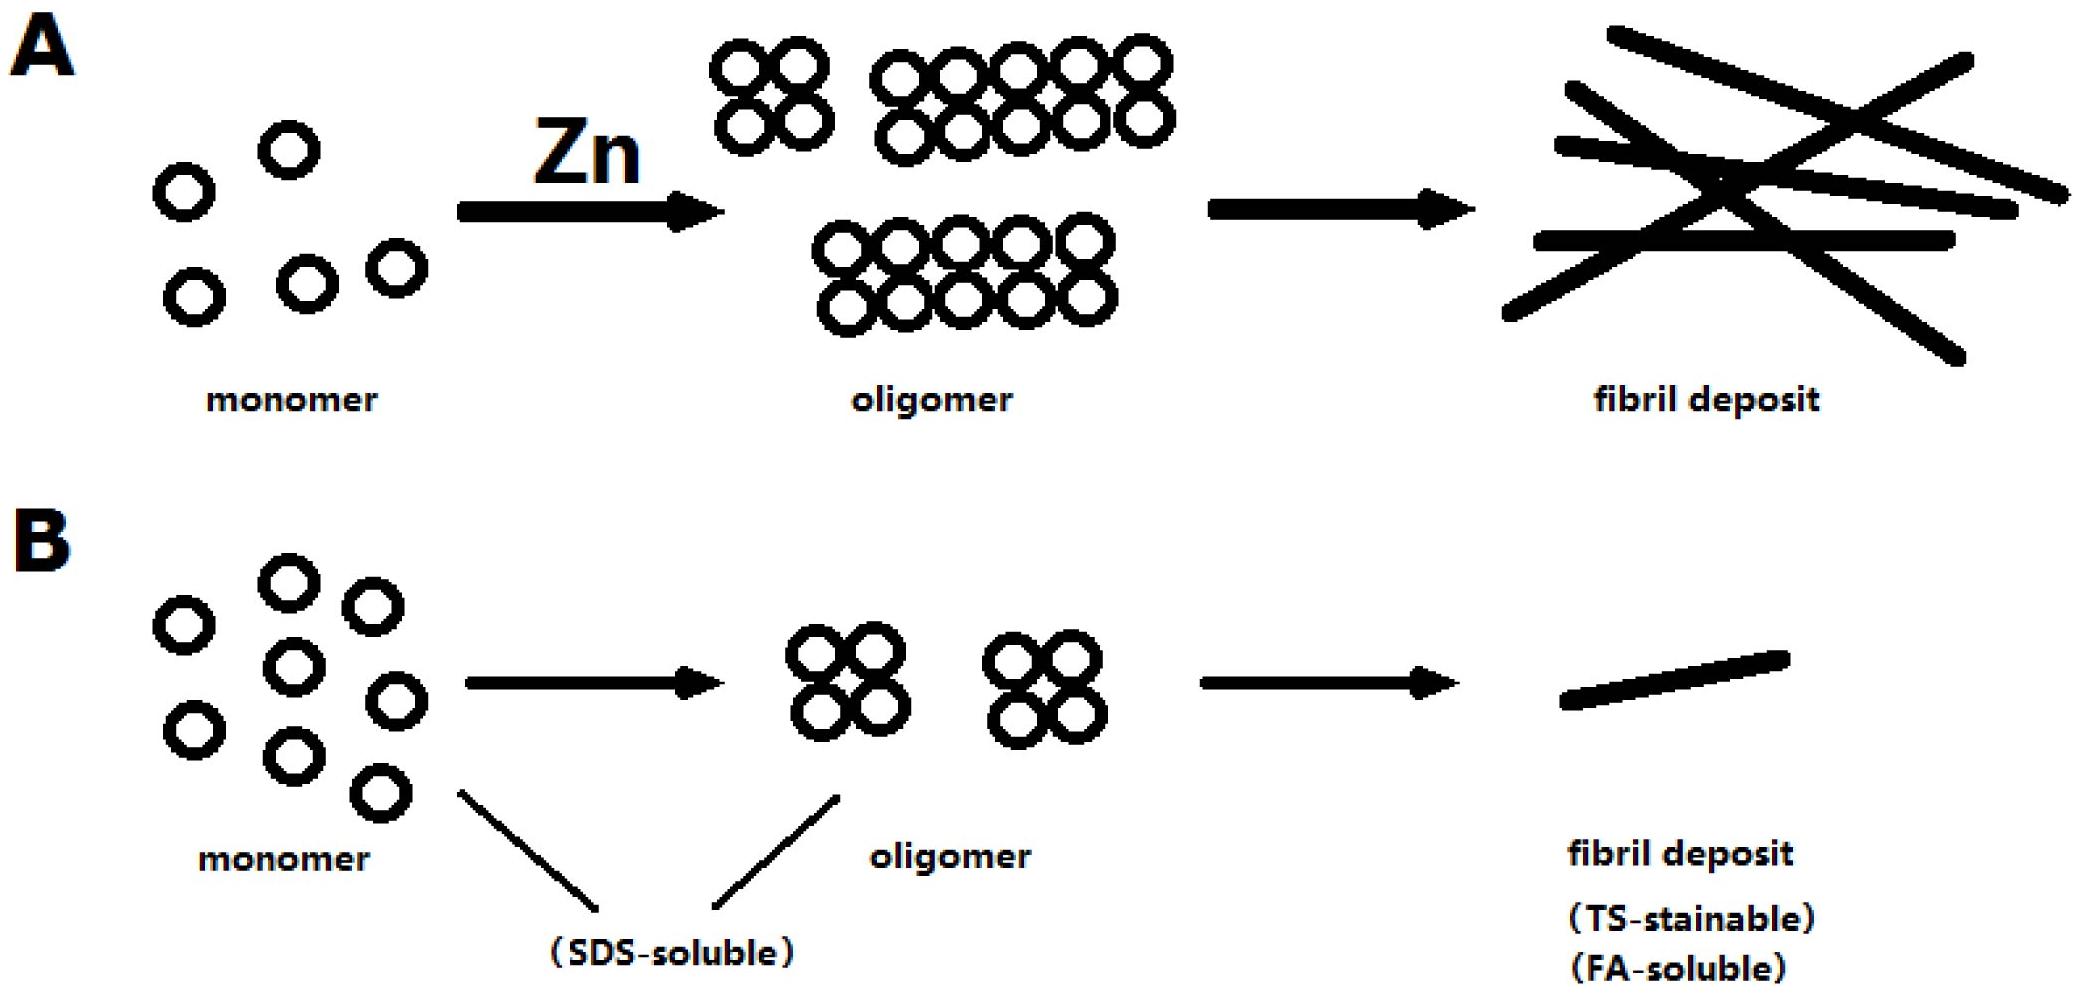 A model to explain zinc's effect on Aβ.